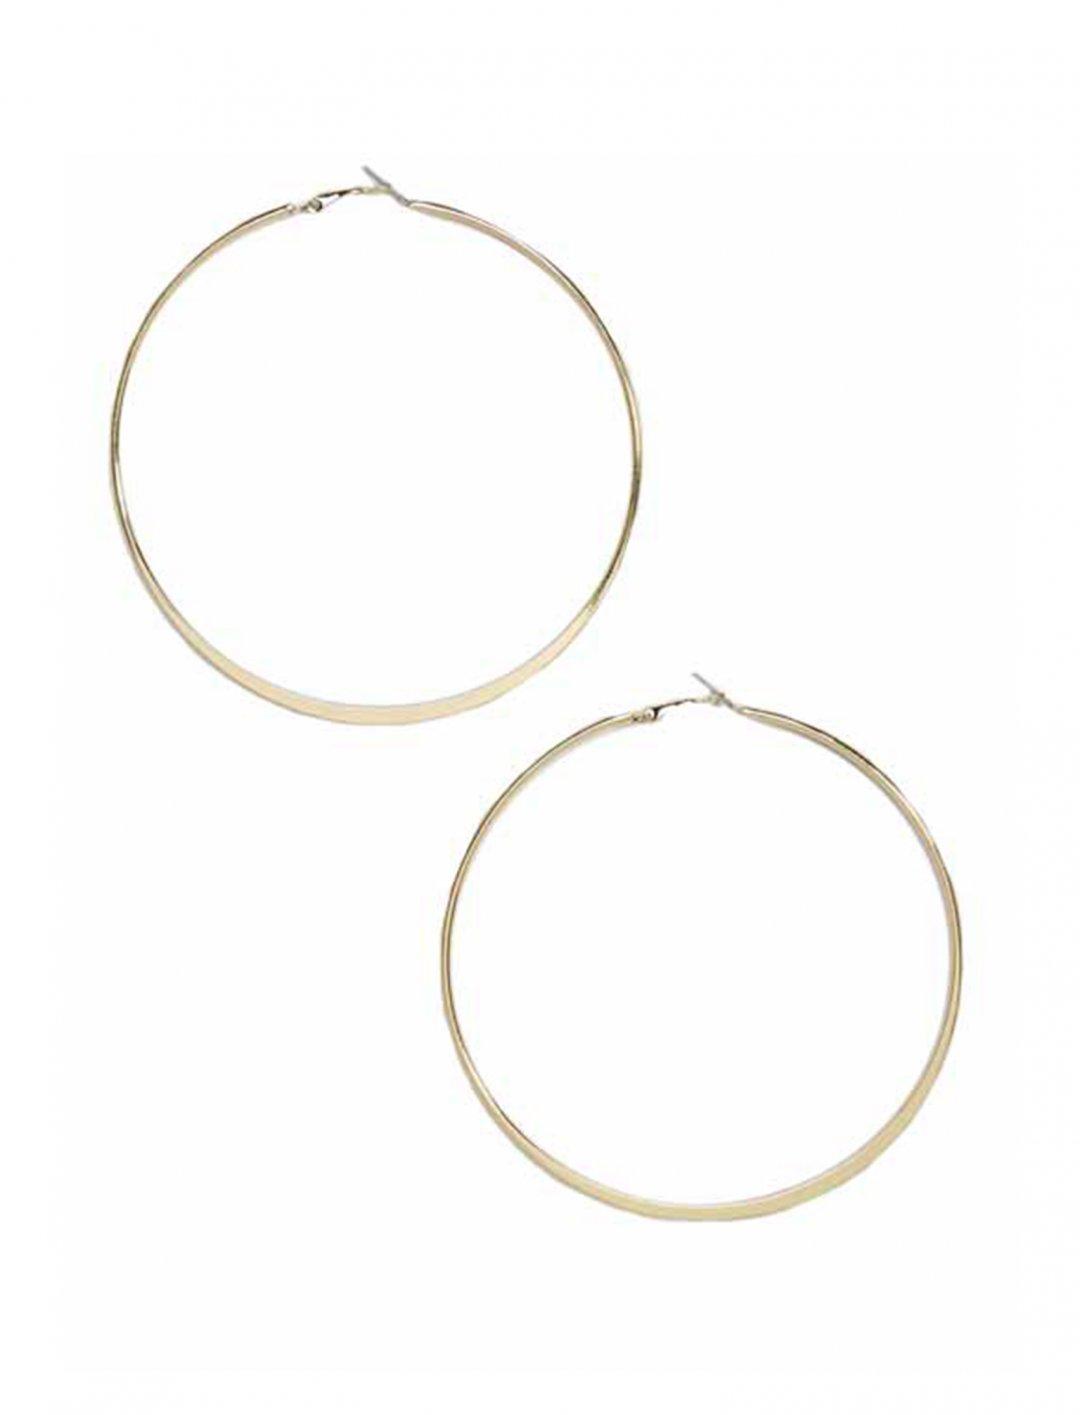 "Oversized Hoop Earrings {""id"":10,""product_section_id"":1,""name"":""Jewellery"",""order"":10} DesignB London"